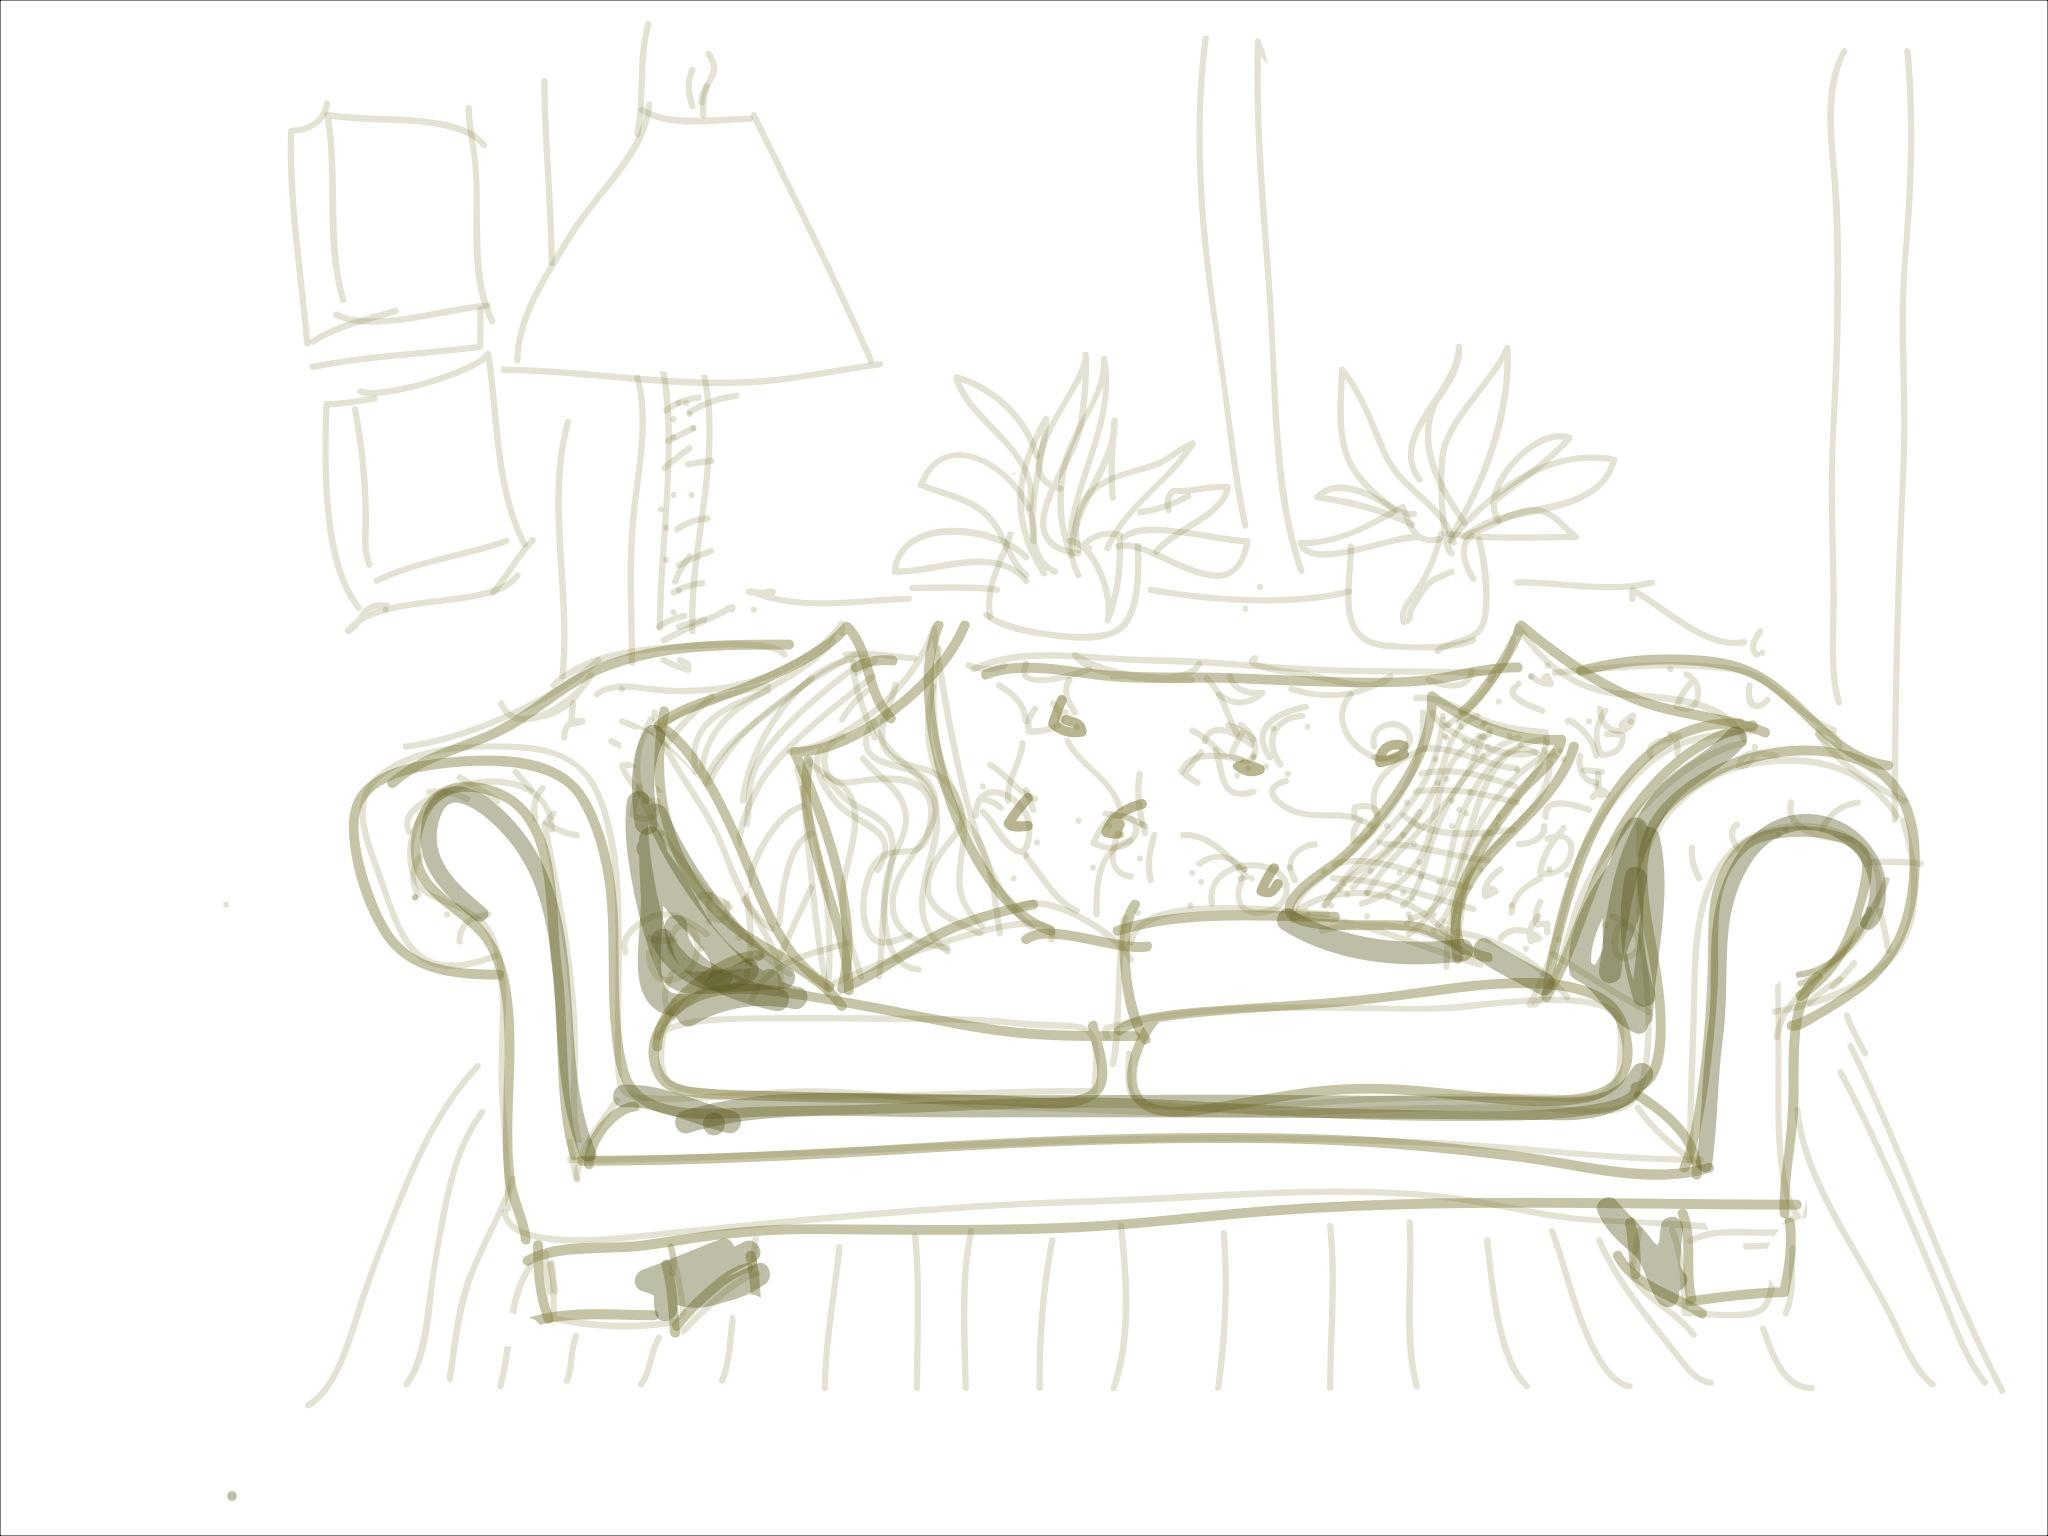 Drawn couch Drawings  iPAD Steps iPAD